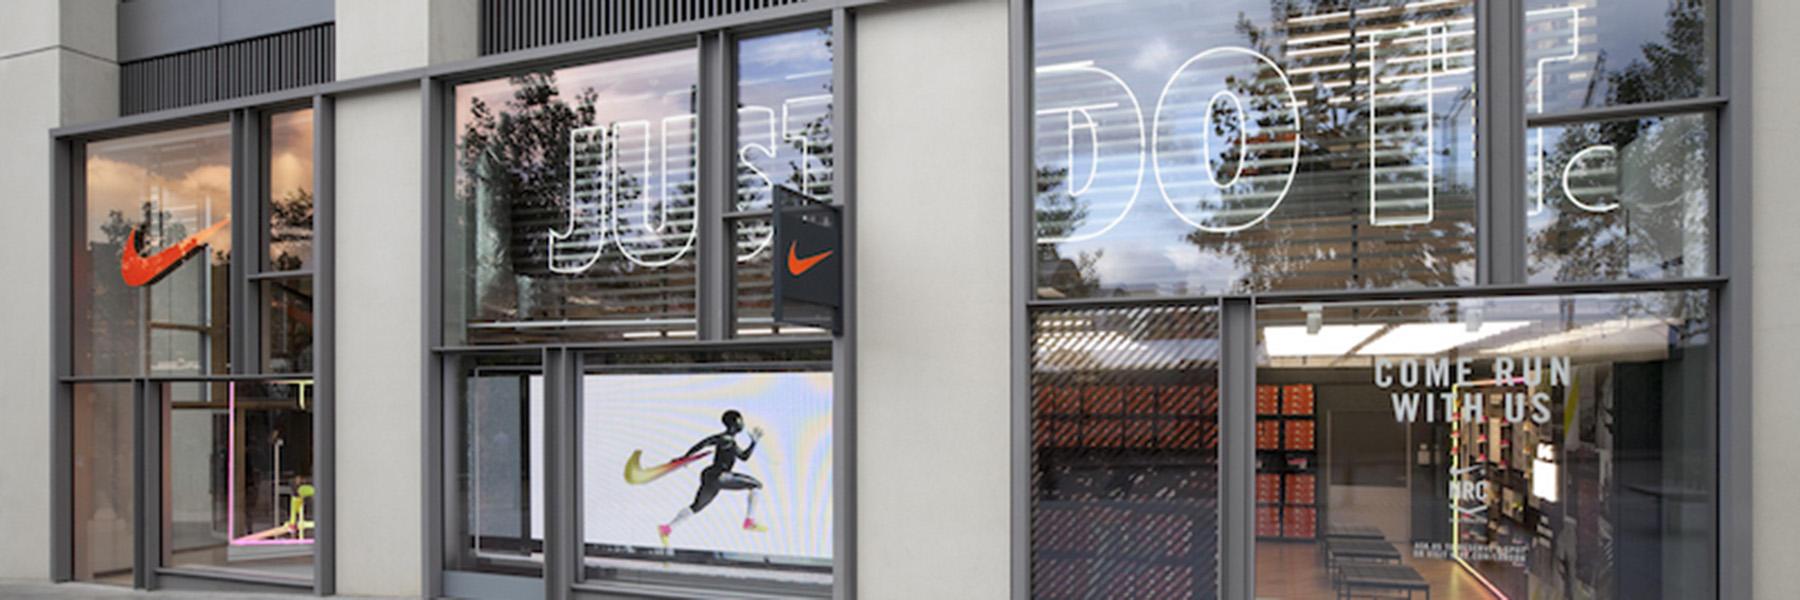 5df2f32b76 Nike Clearance Store Thessaloniki. Thessaloniki